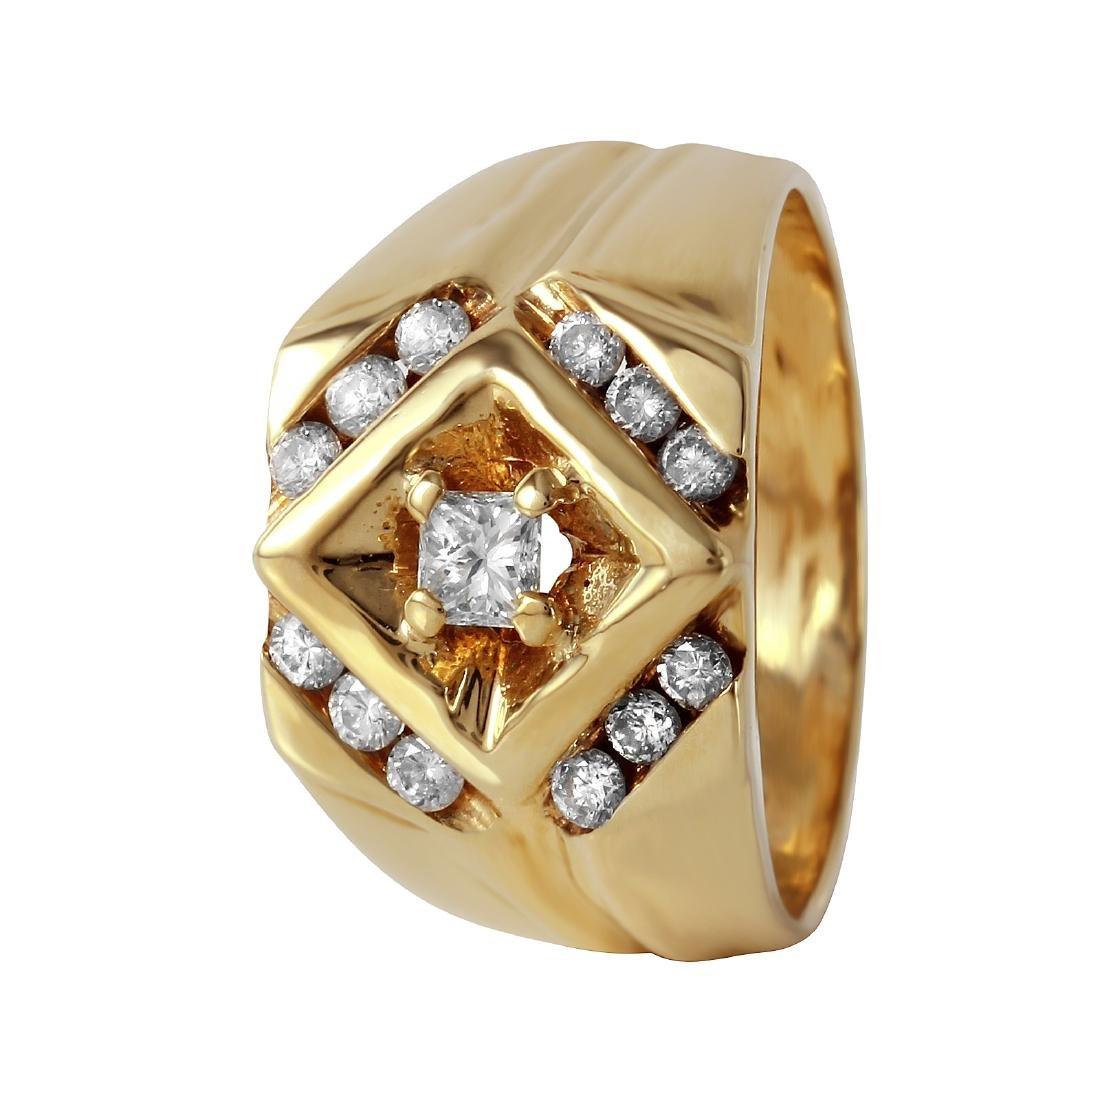 Men's 14KT Yellow Gold Diamond Ring